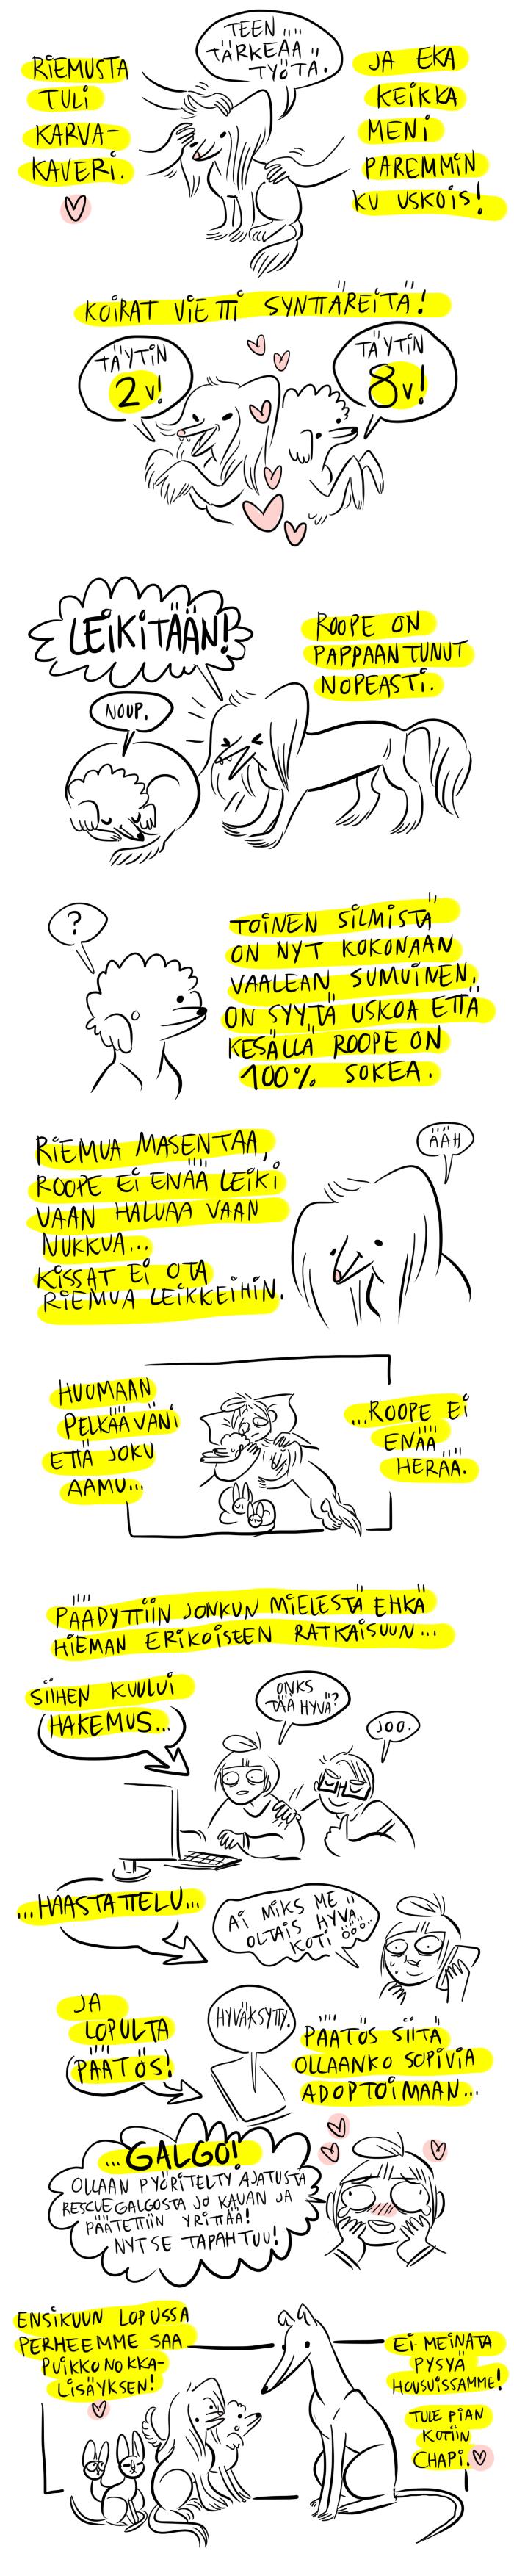 rooperiemuchapi